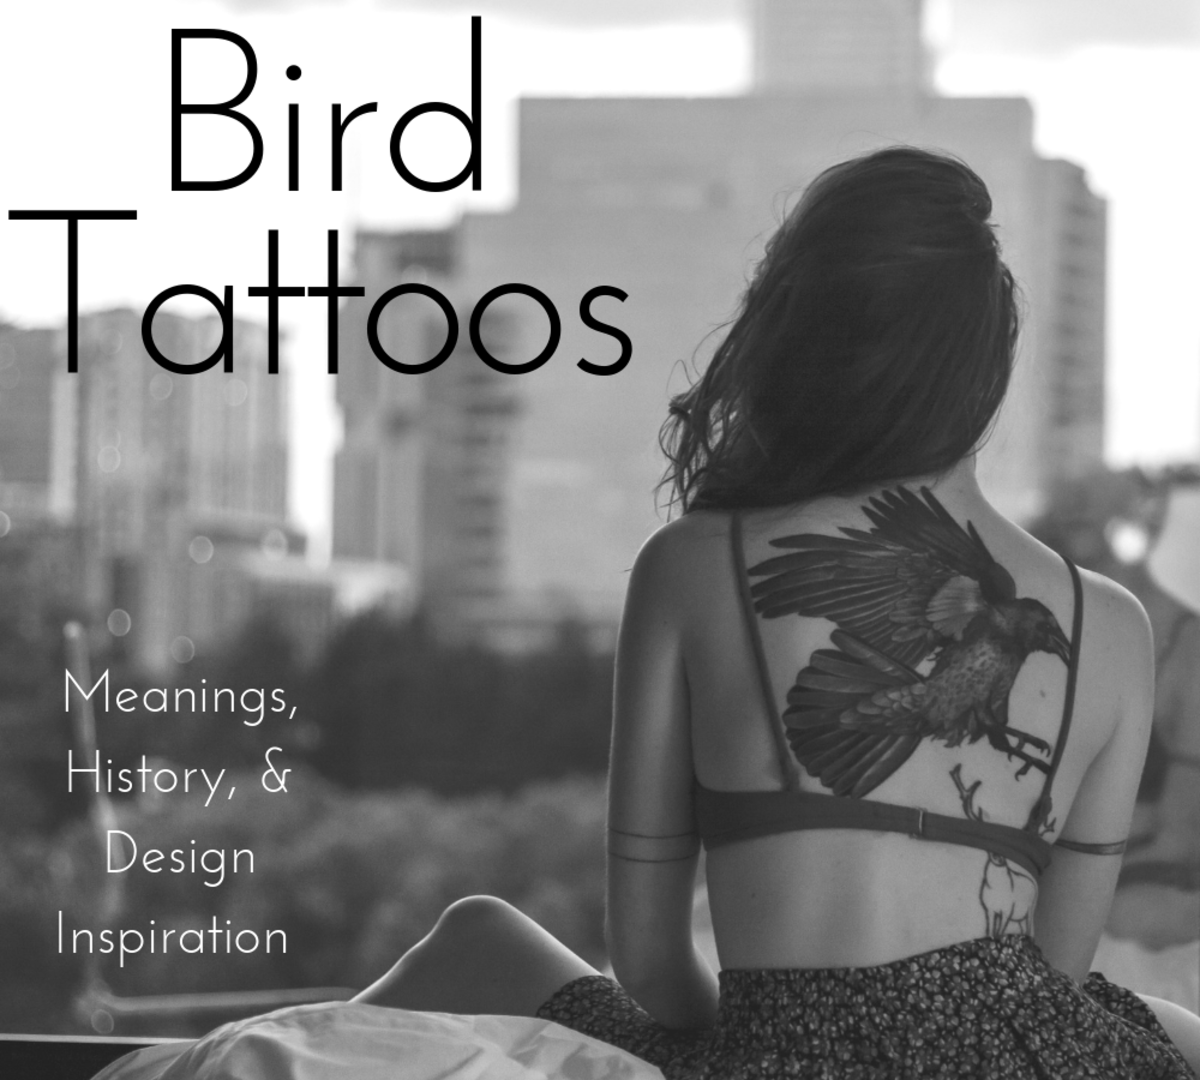 Bird Tattoos Interpreted: What Various Birds Mean